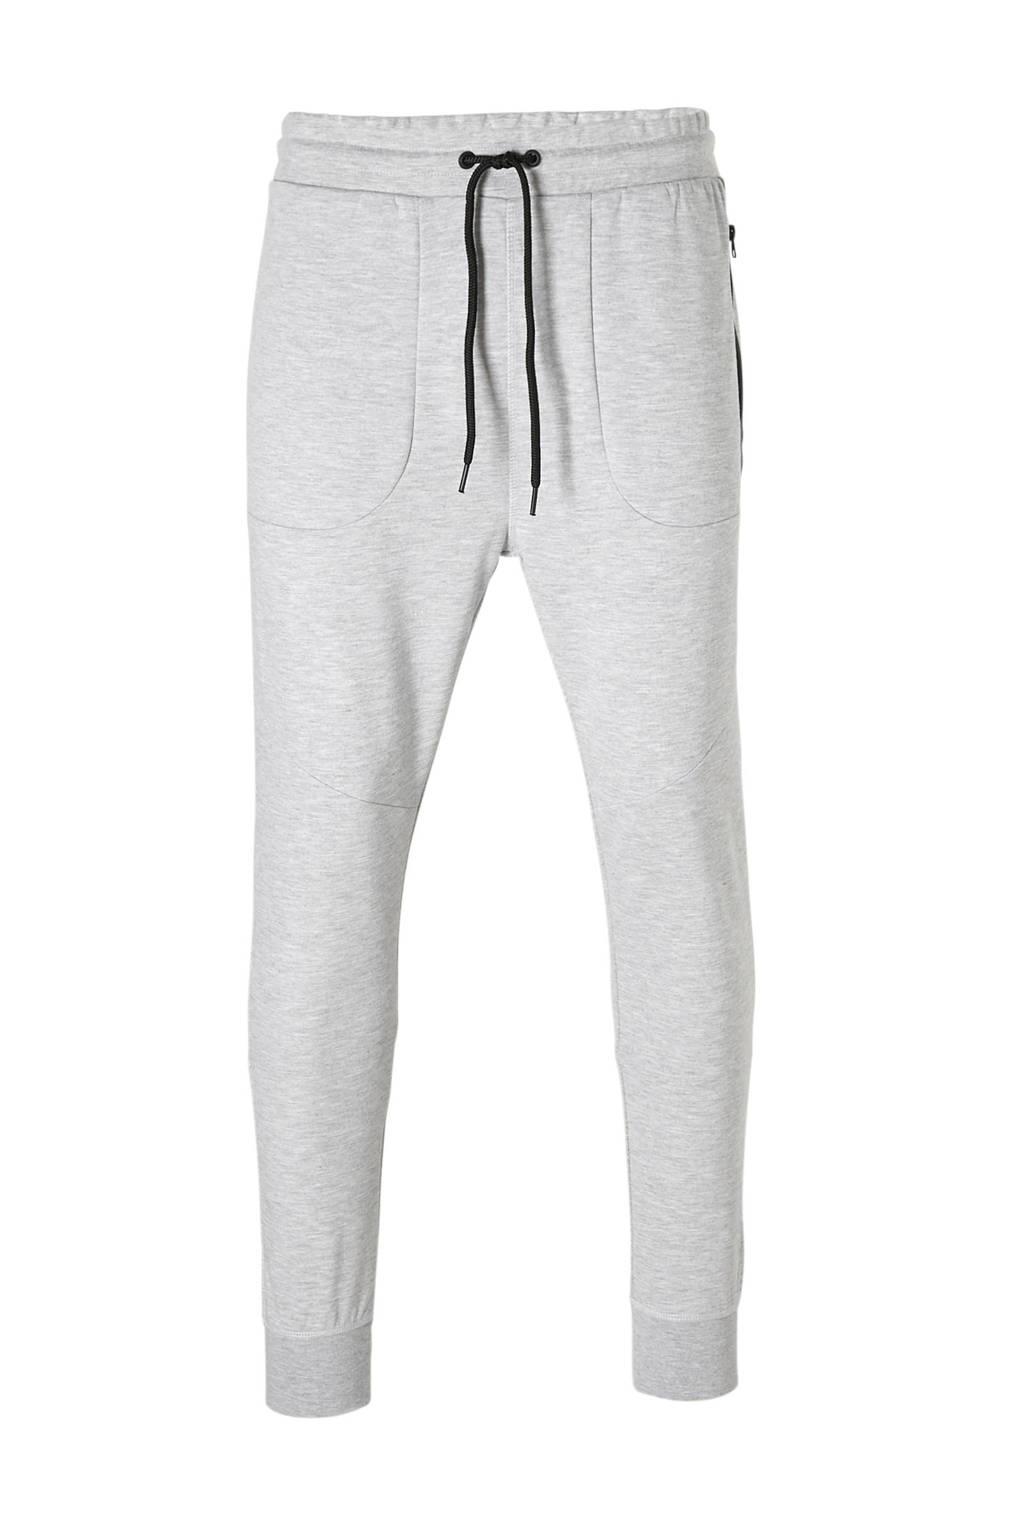 Jack & Jones Core Newwill sweatpants, Lichtgrijs melange